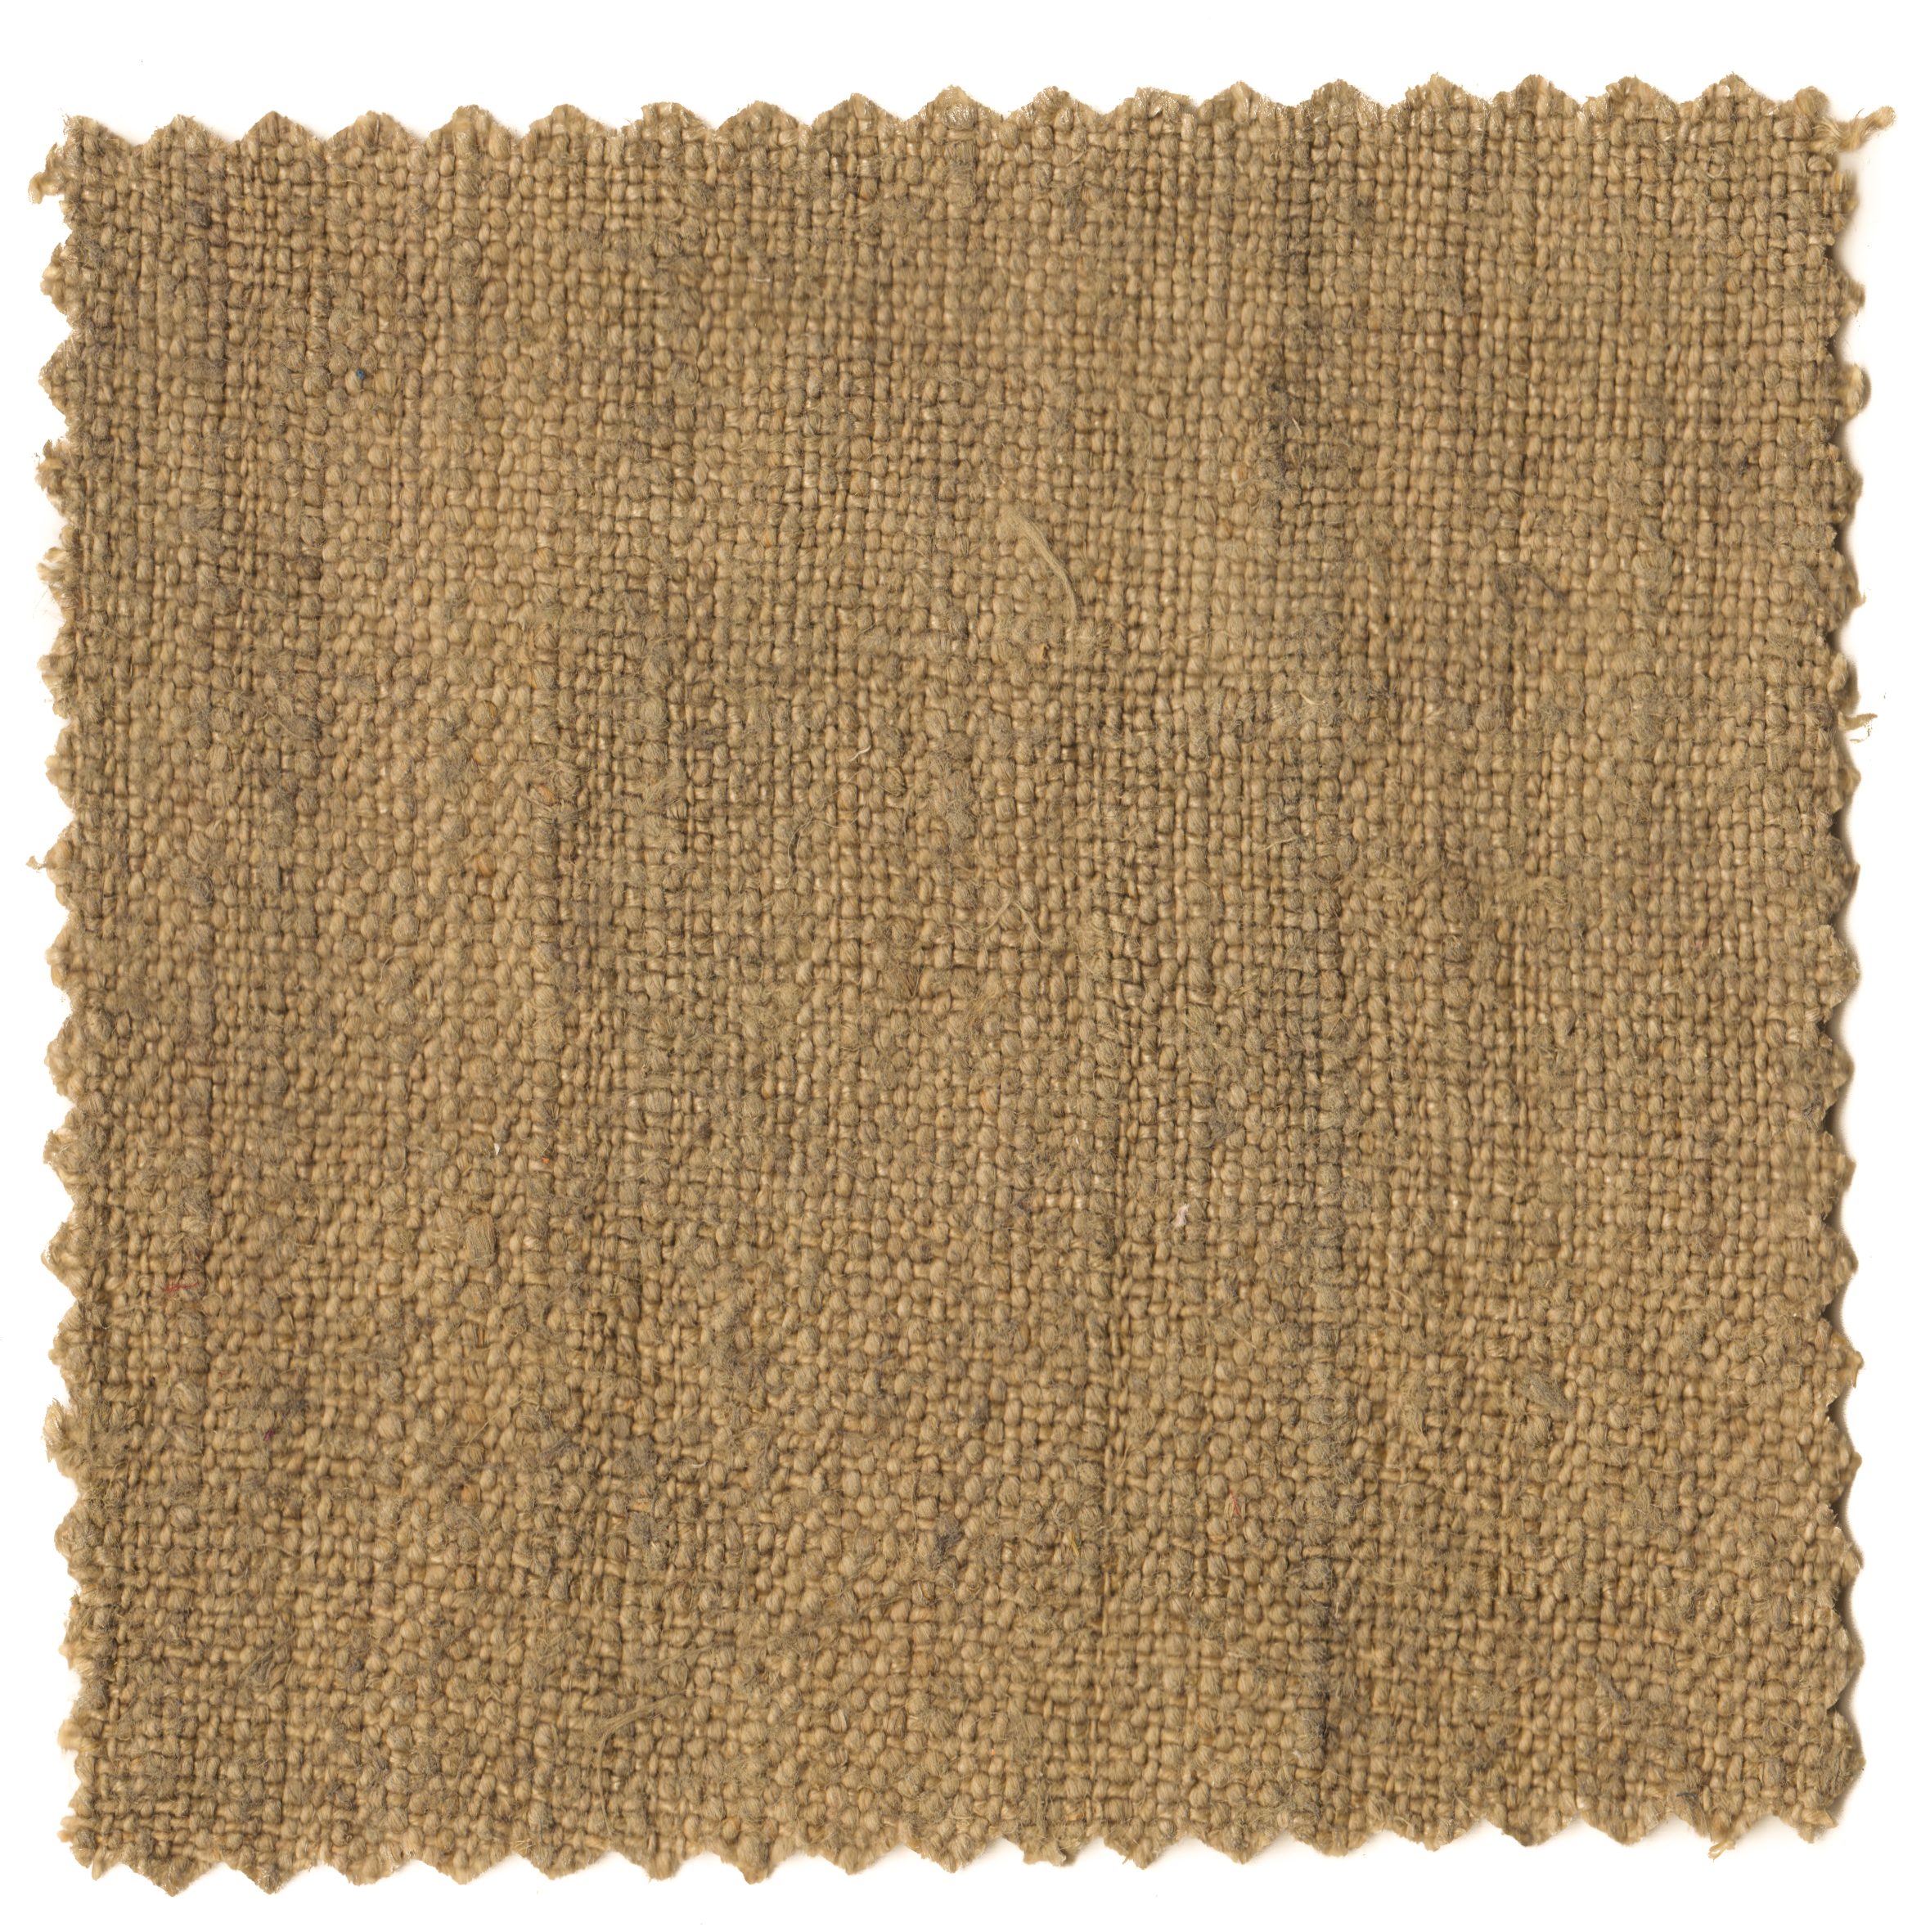 Walnut Browns-1.jpg